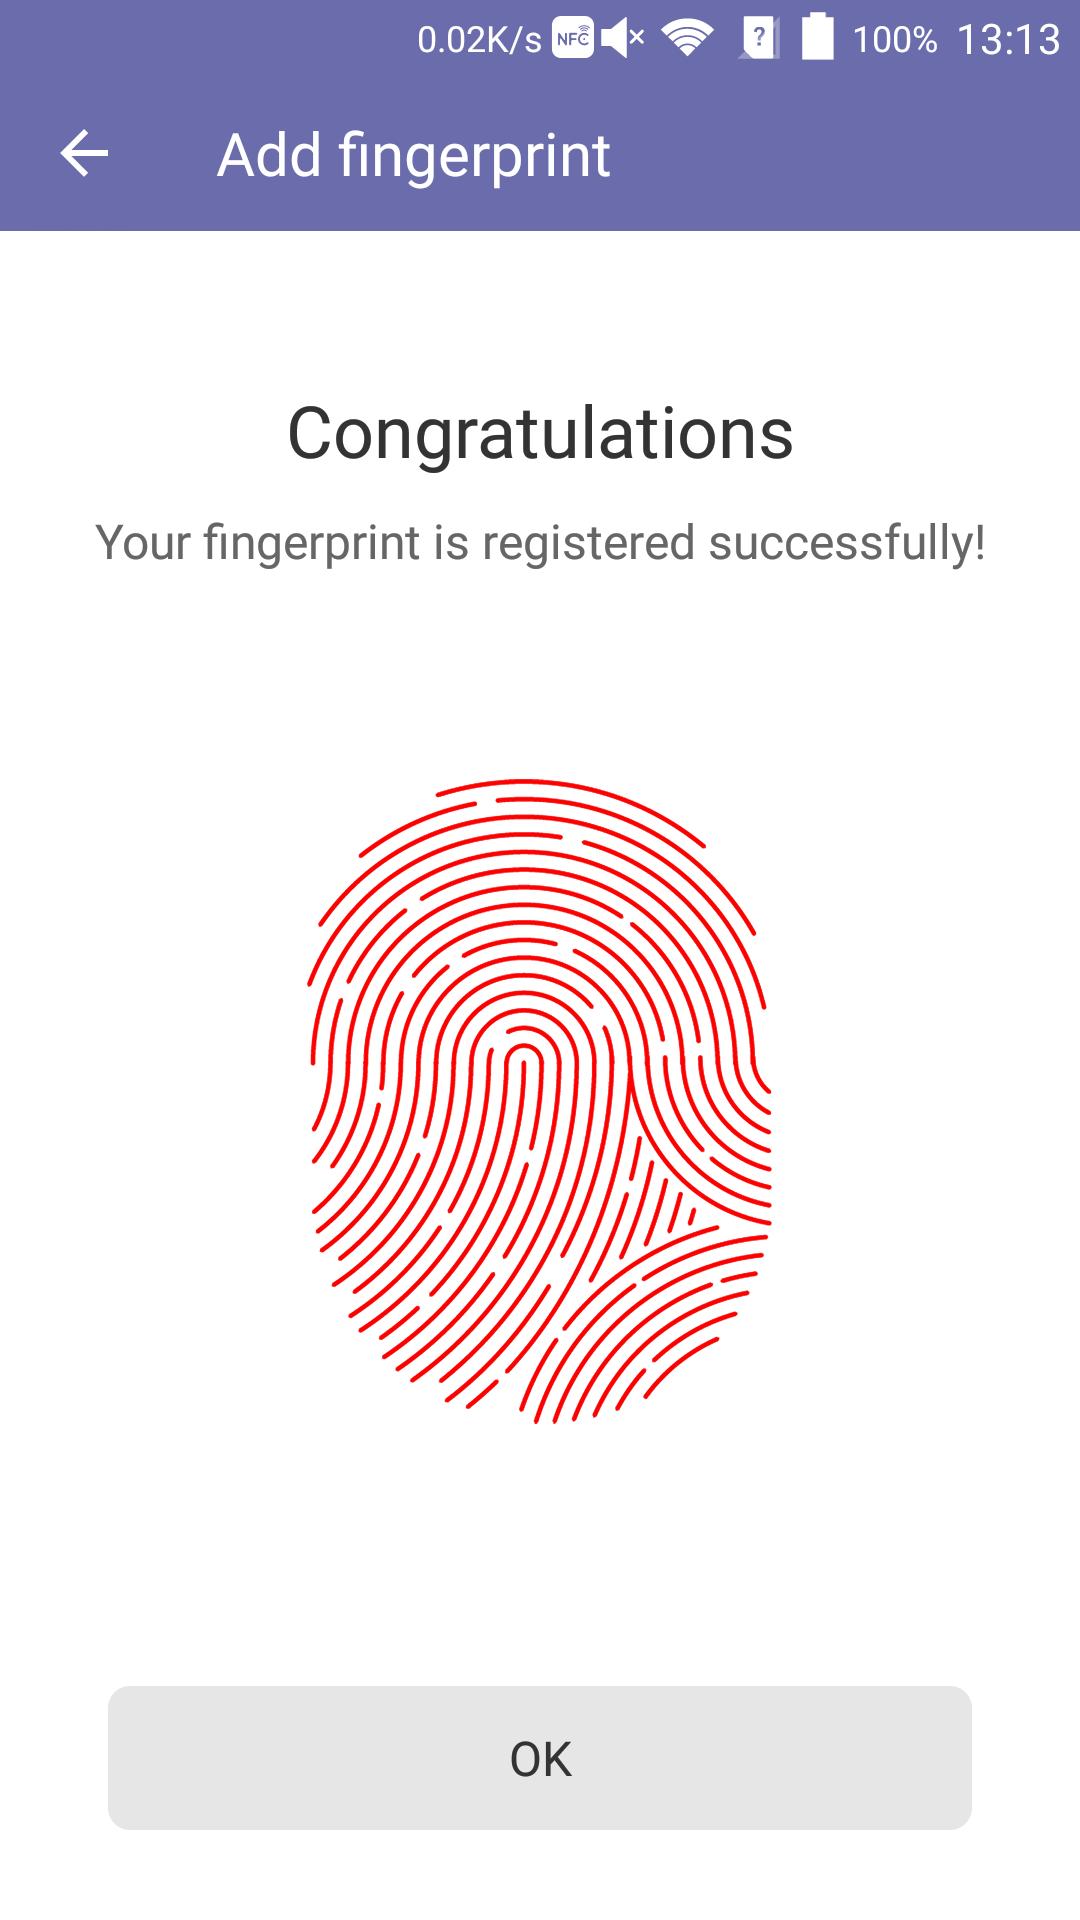 zte axon fingerprint hours has